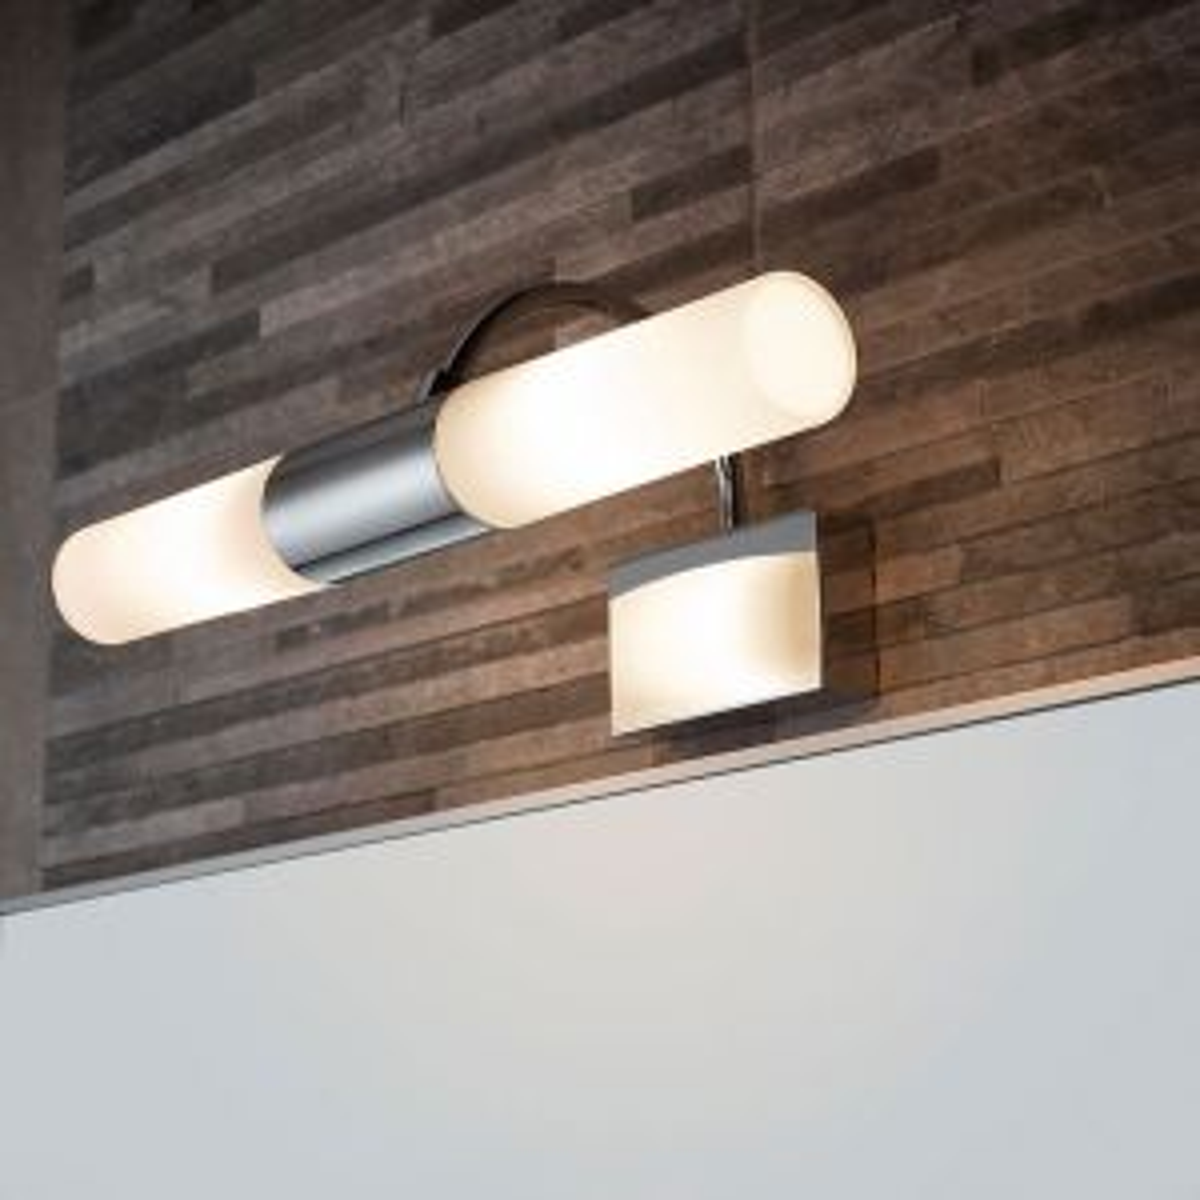 Sensio Phoenix Double Tube LED Wall Light Lifestyle